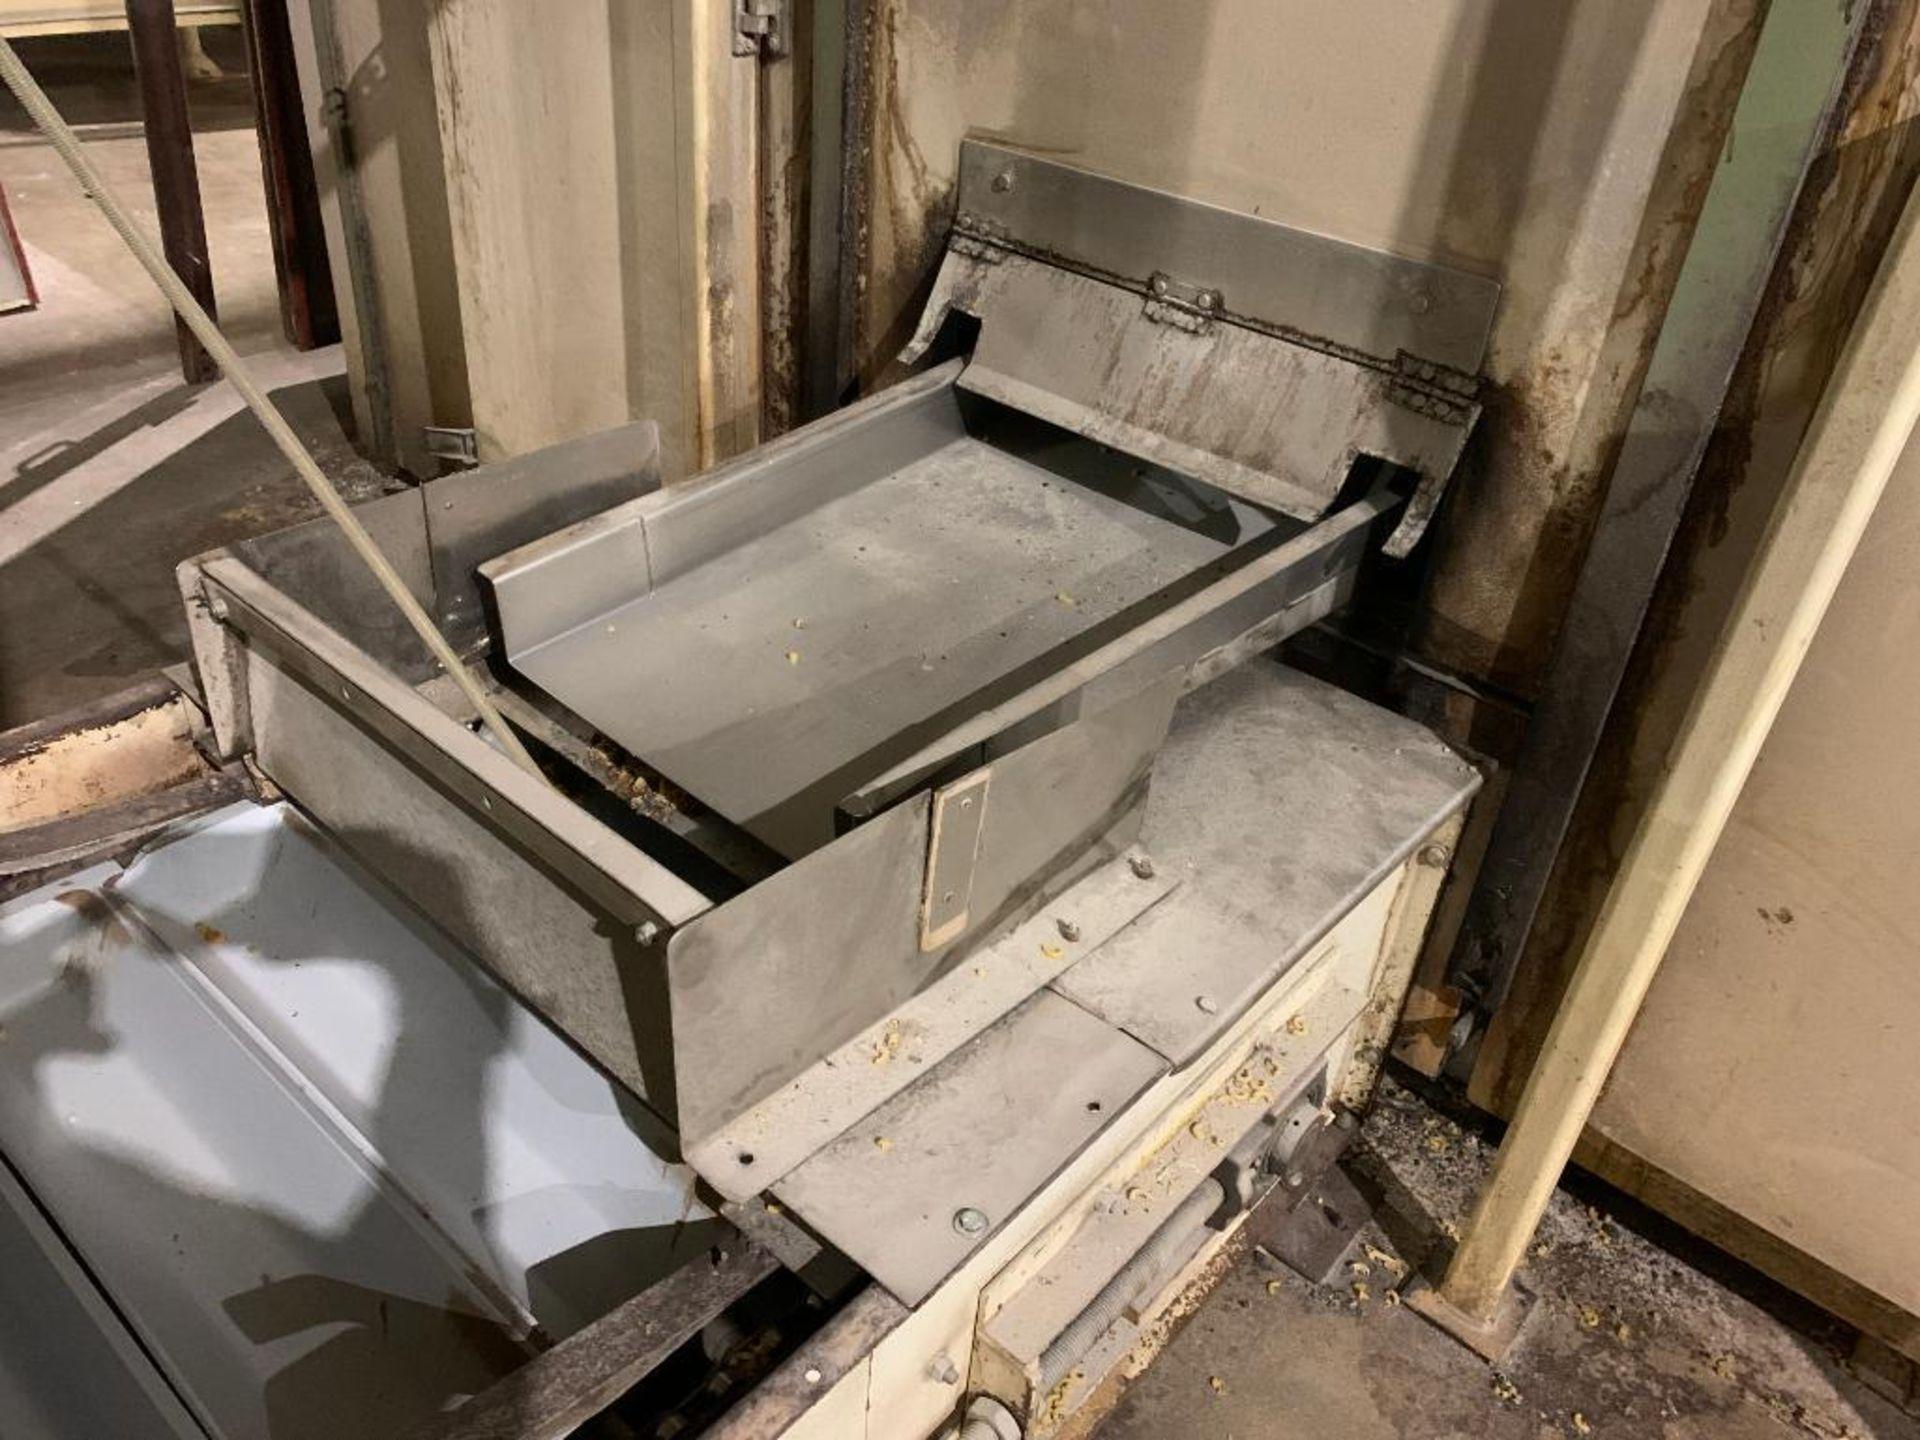 Meyer overlapping bucket elevator, model PA462-24-S - Image 2 of 17